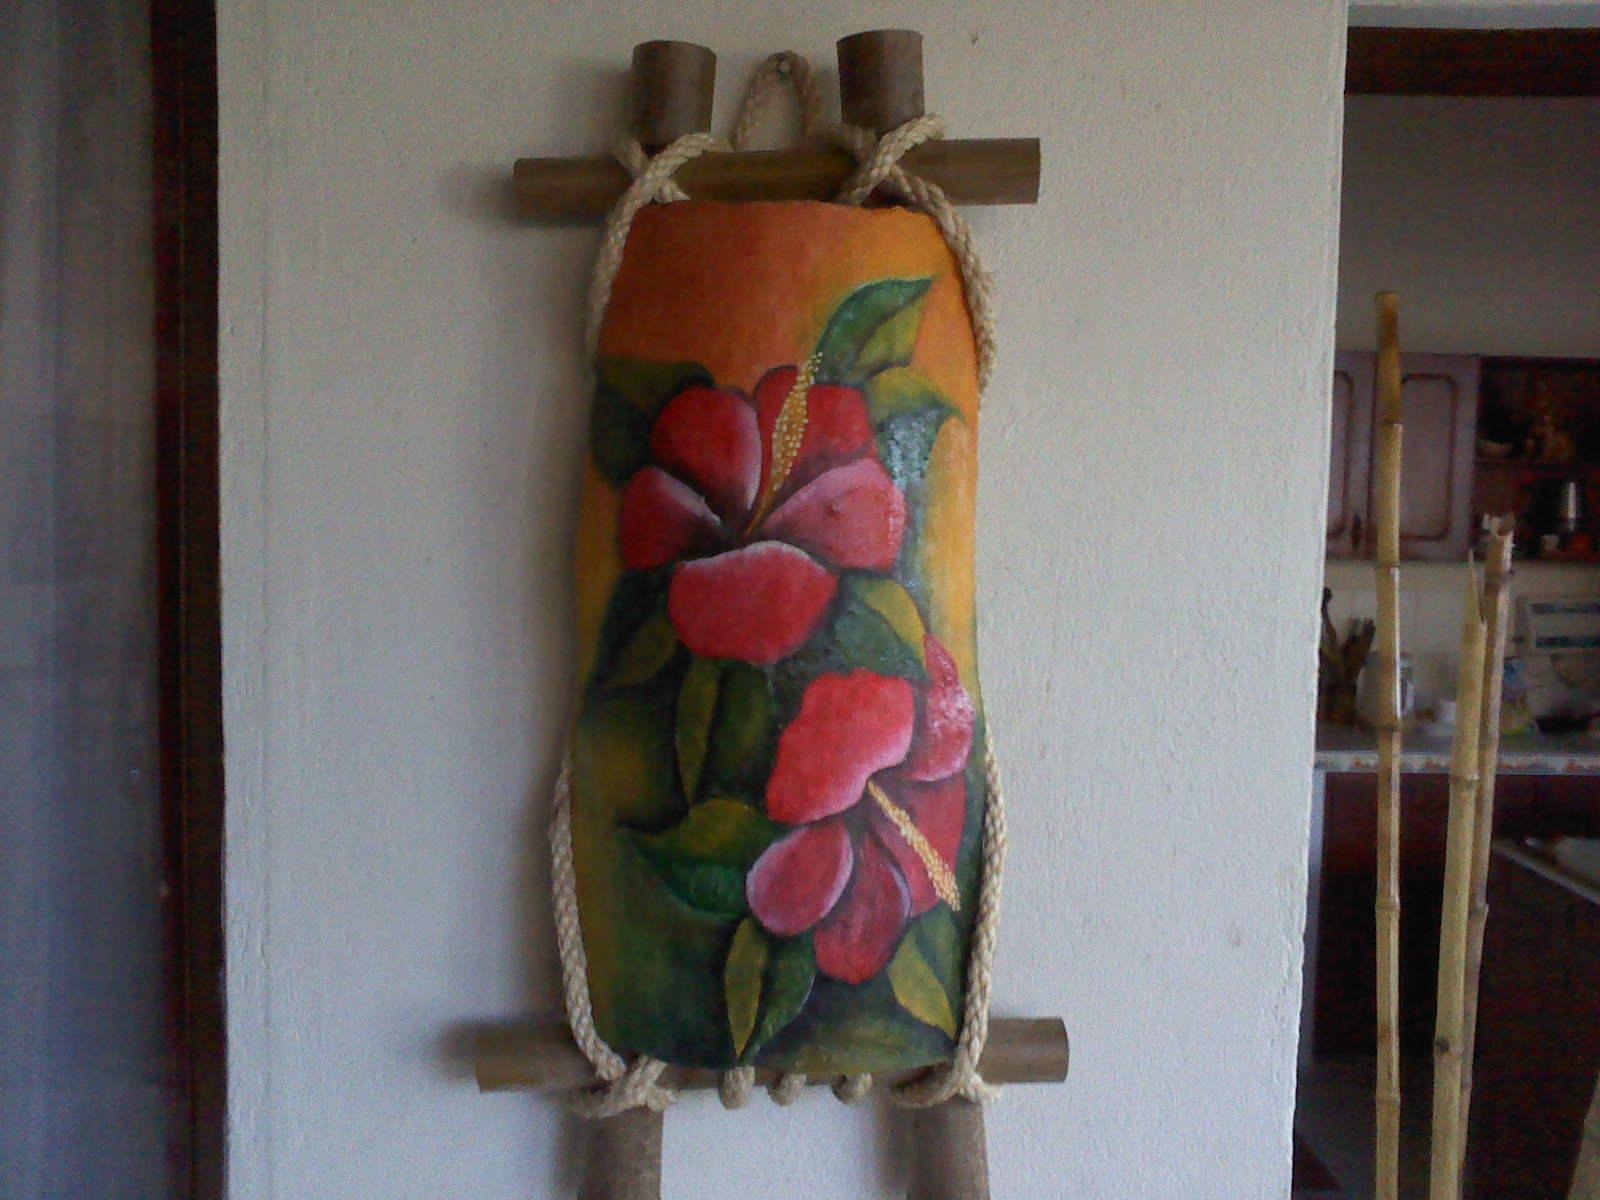 Pintura sobre tejas manualidades camerom - Pintura para tejas ...